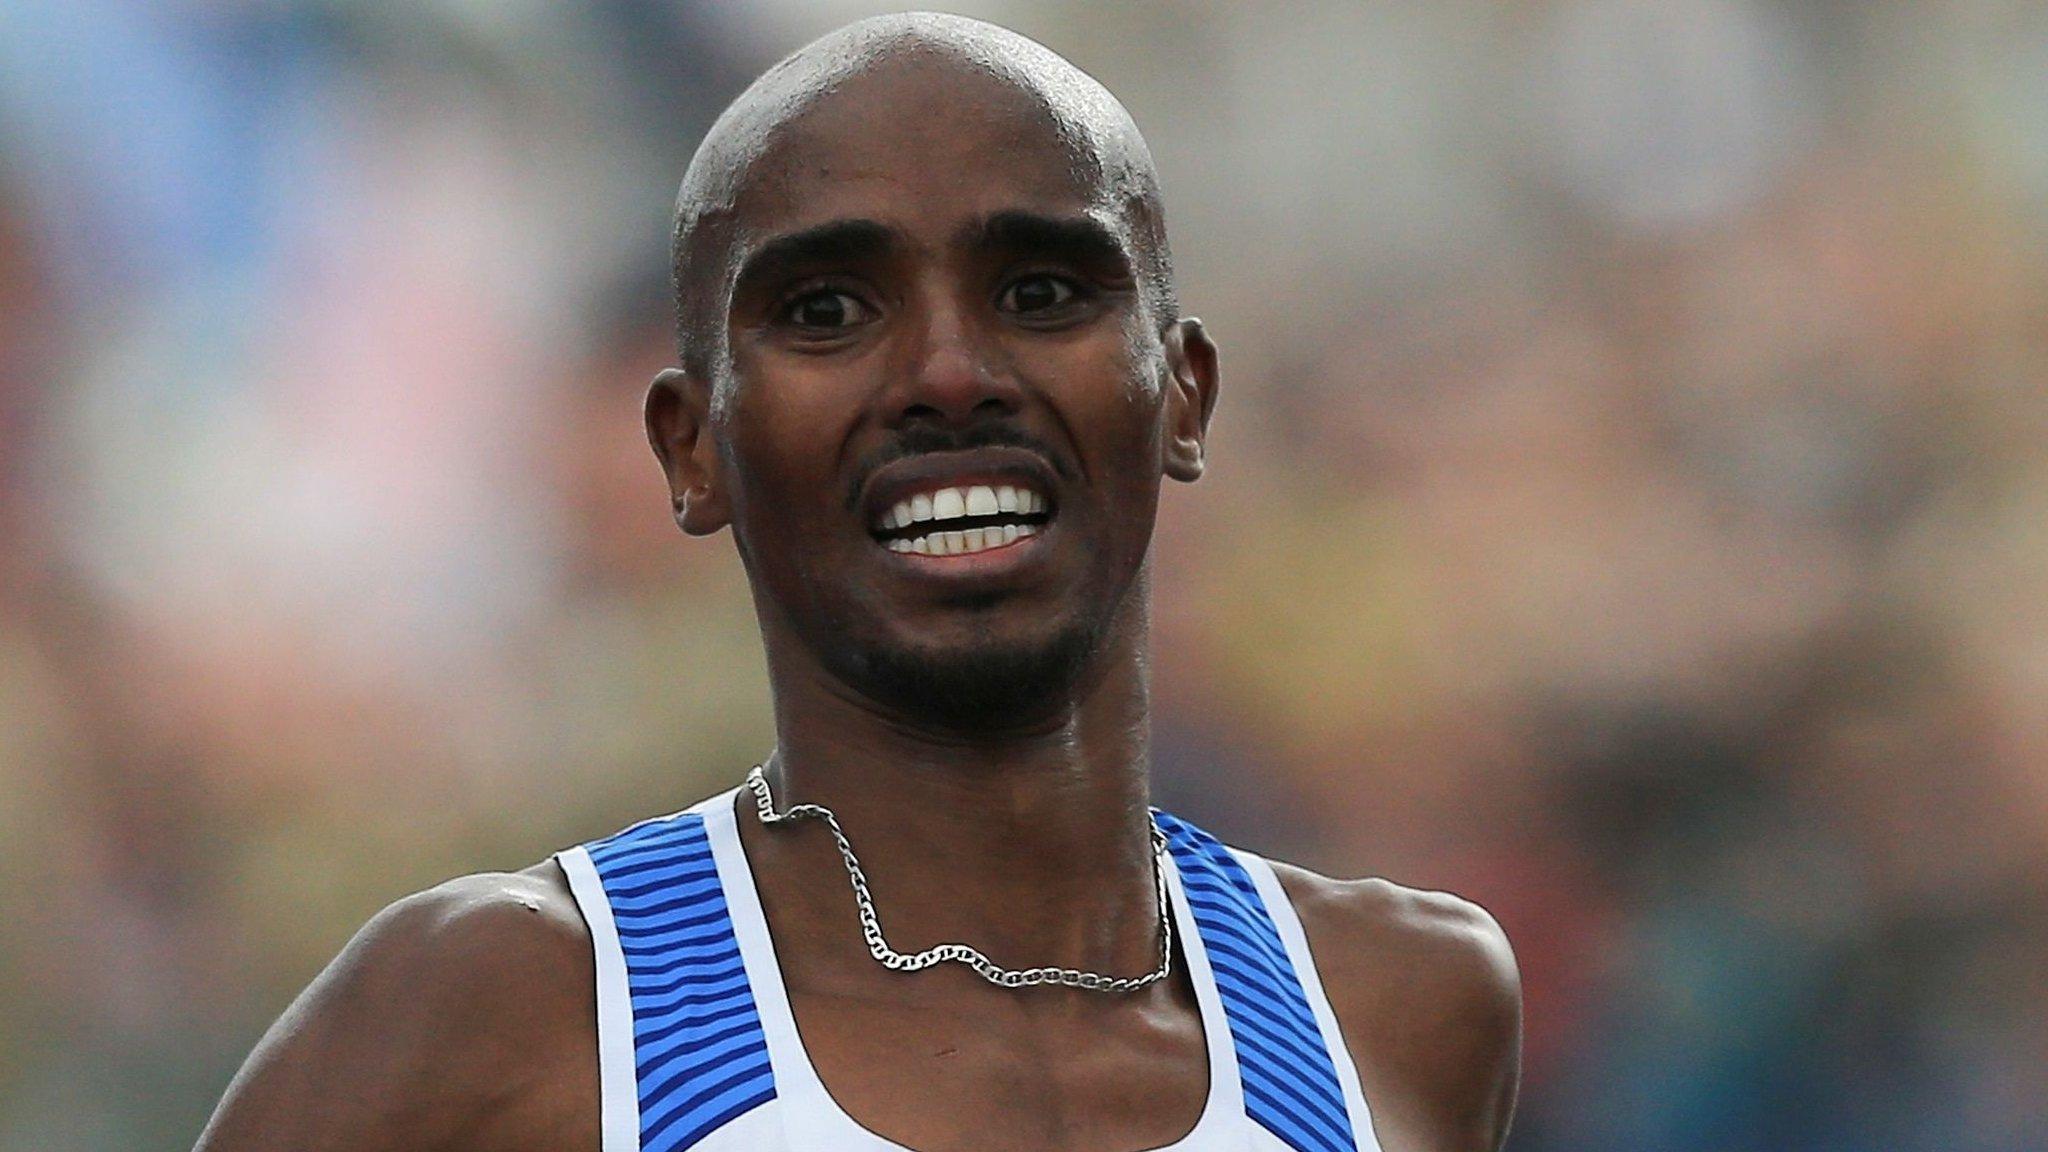 Farah & Hawkins set for London half marathon showdown